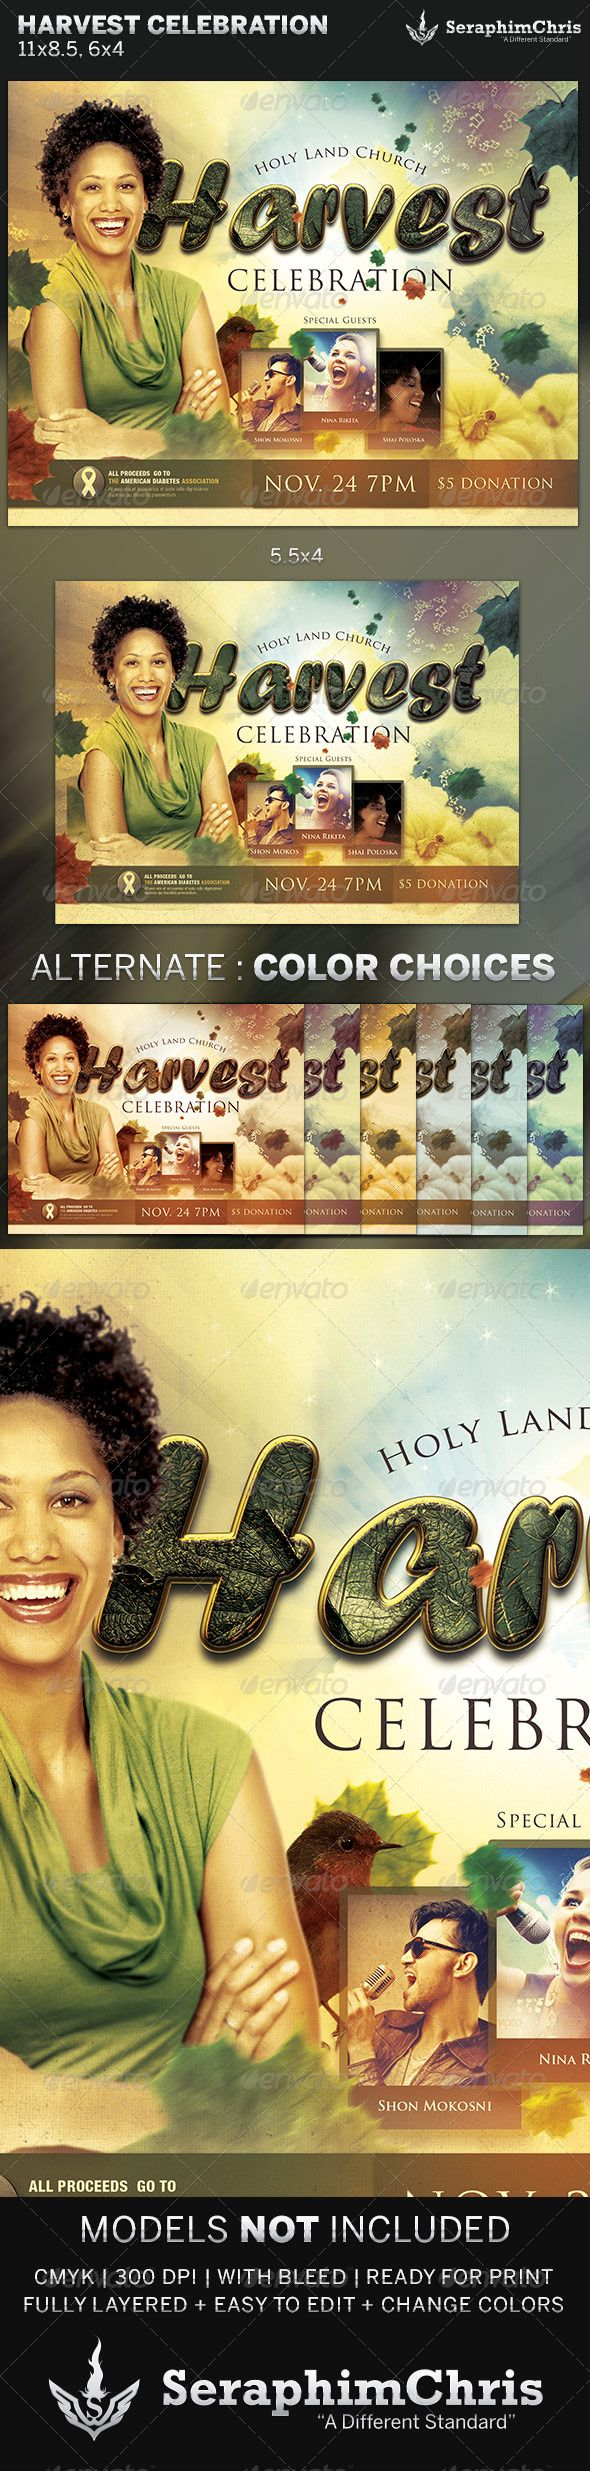 Harvest Celebration: Church Flyer Template — Photoshop PSD #Gospel Concert Flyer #nonprofit • Available here → https://graphicriver.net/item/harvest-celebration-church-flyer-template/5884290?ref=pxcr